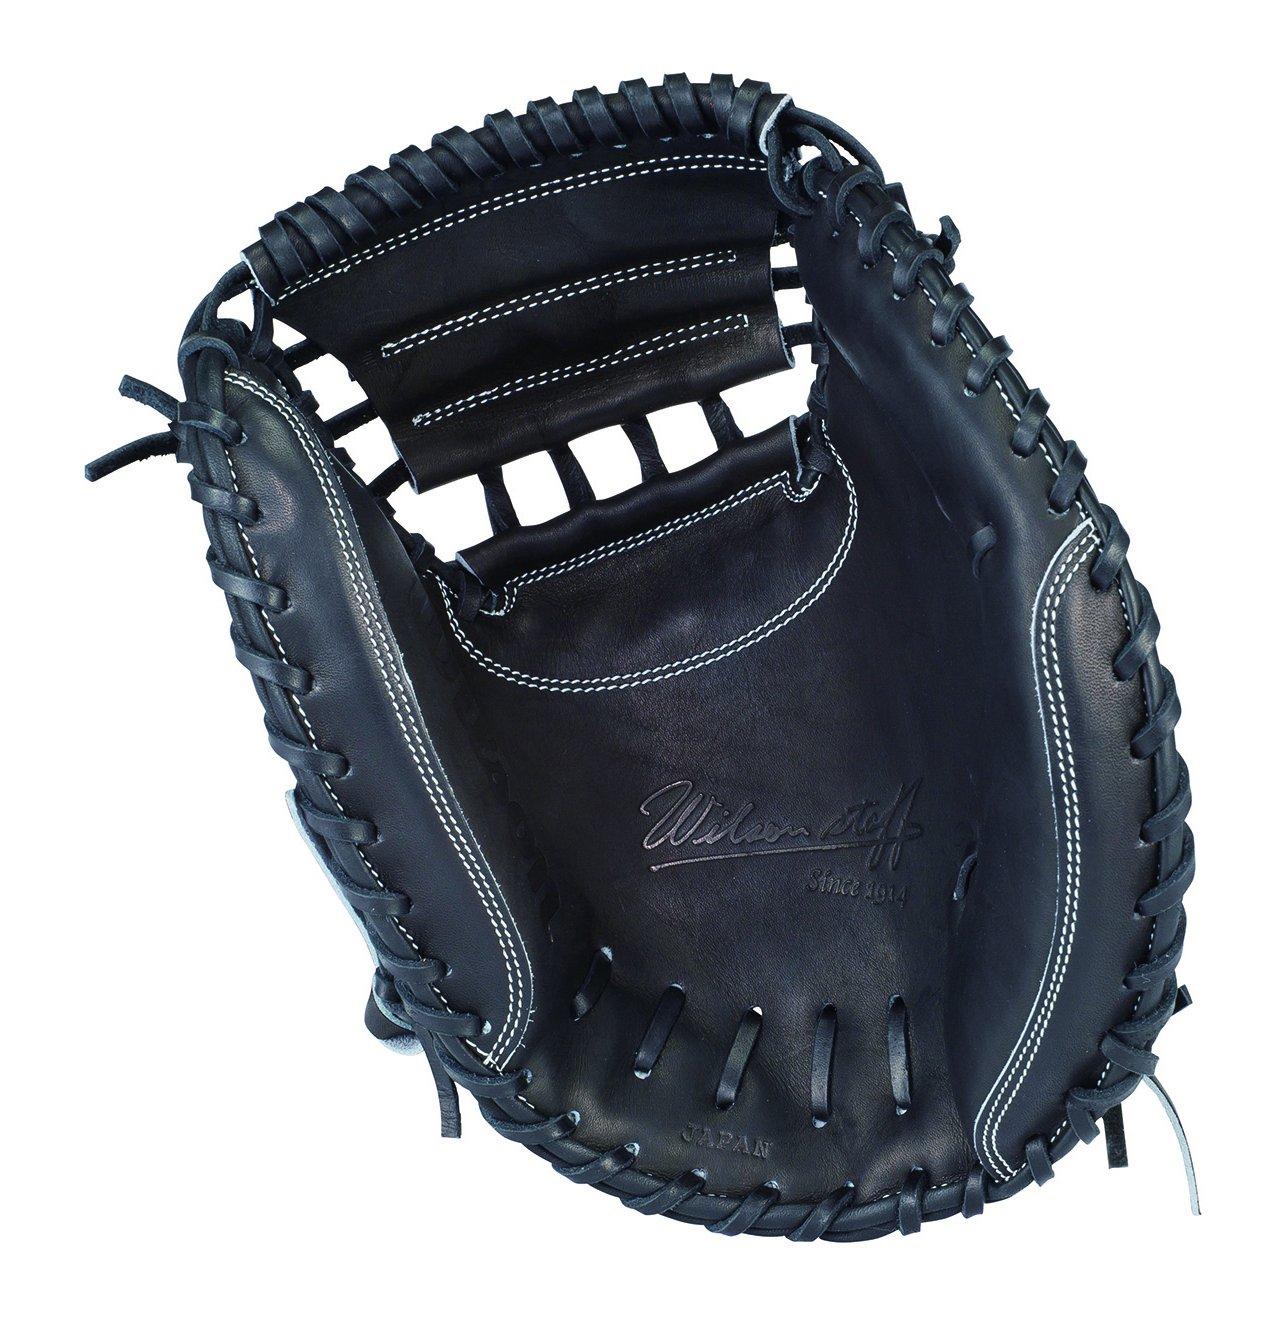 Wilson(ウイルソン) 硬式野球用 グローブ 捕手用 (右投げ用) WTAHWP2SZ B01BWOD2XY  ブラック